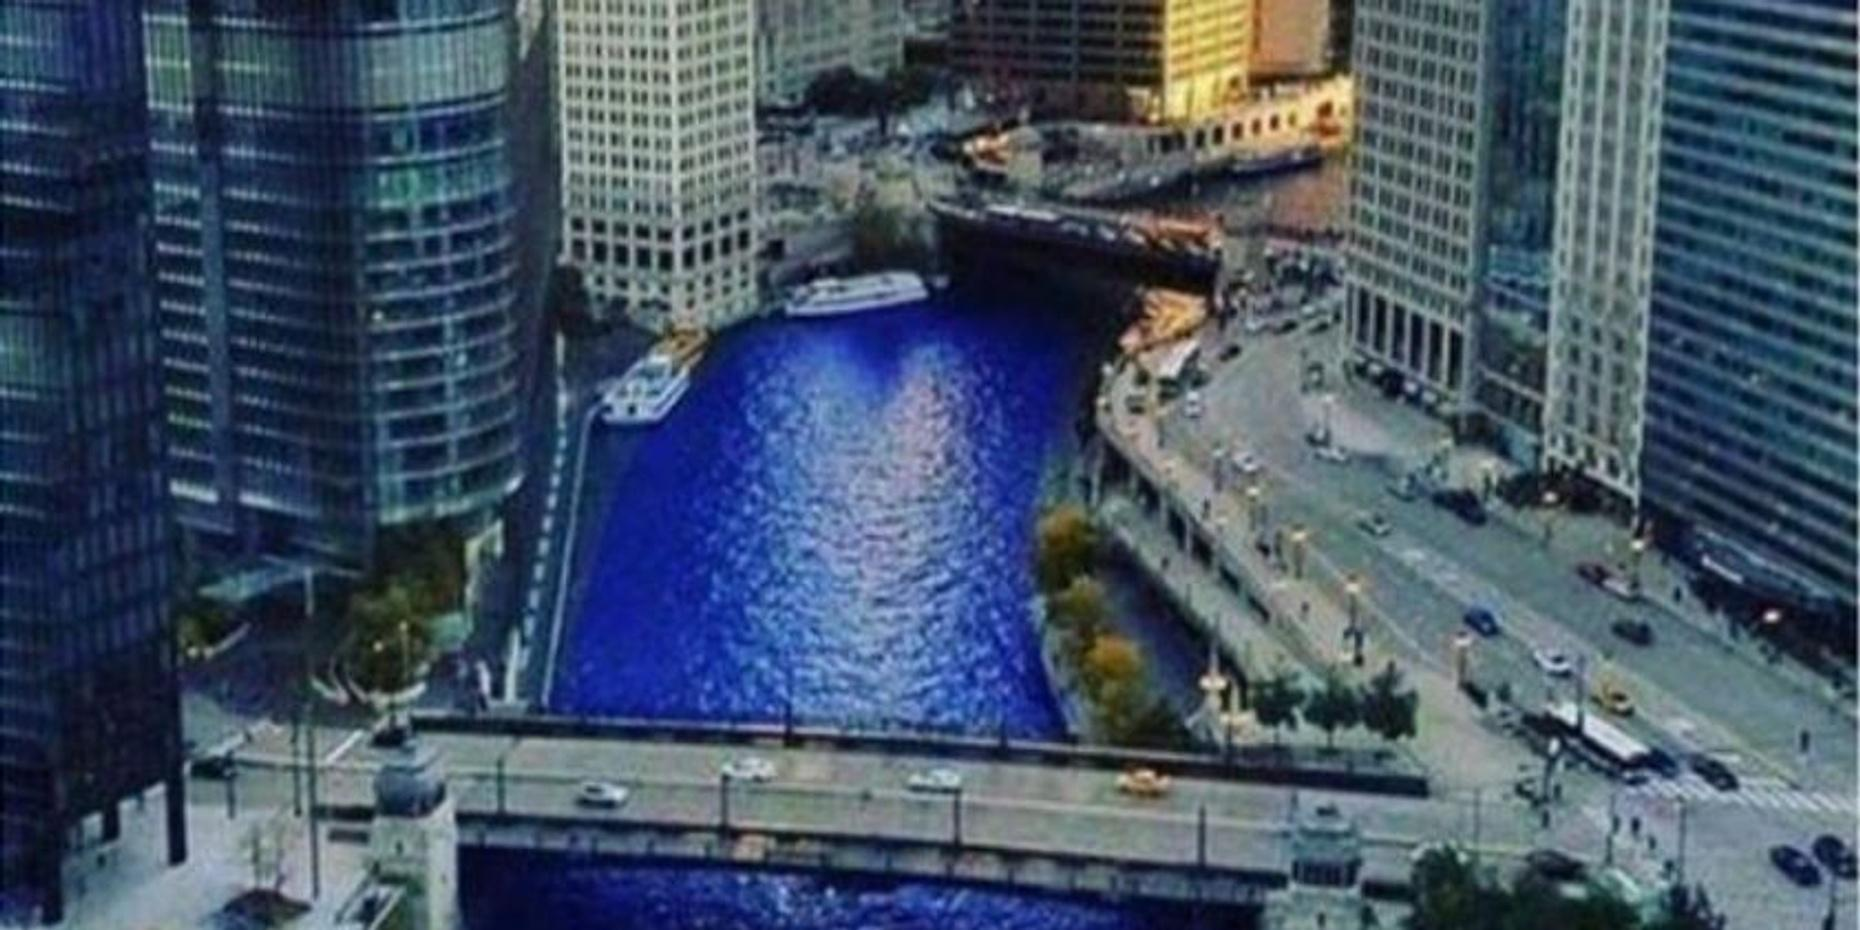 The Chicago River Boat Architecture Tour